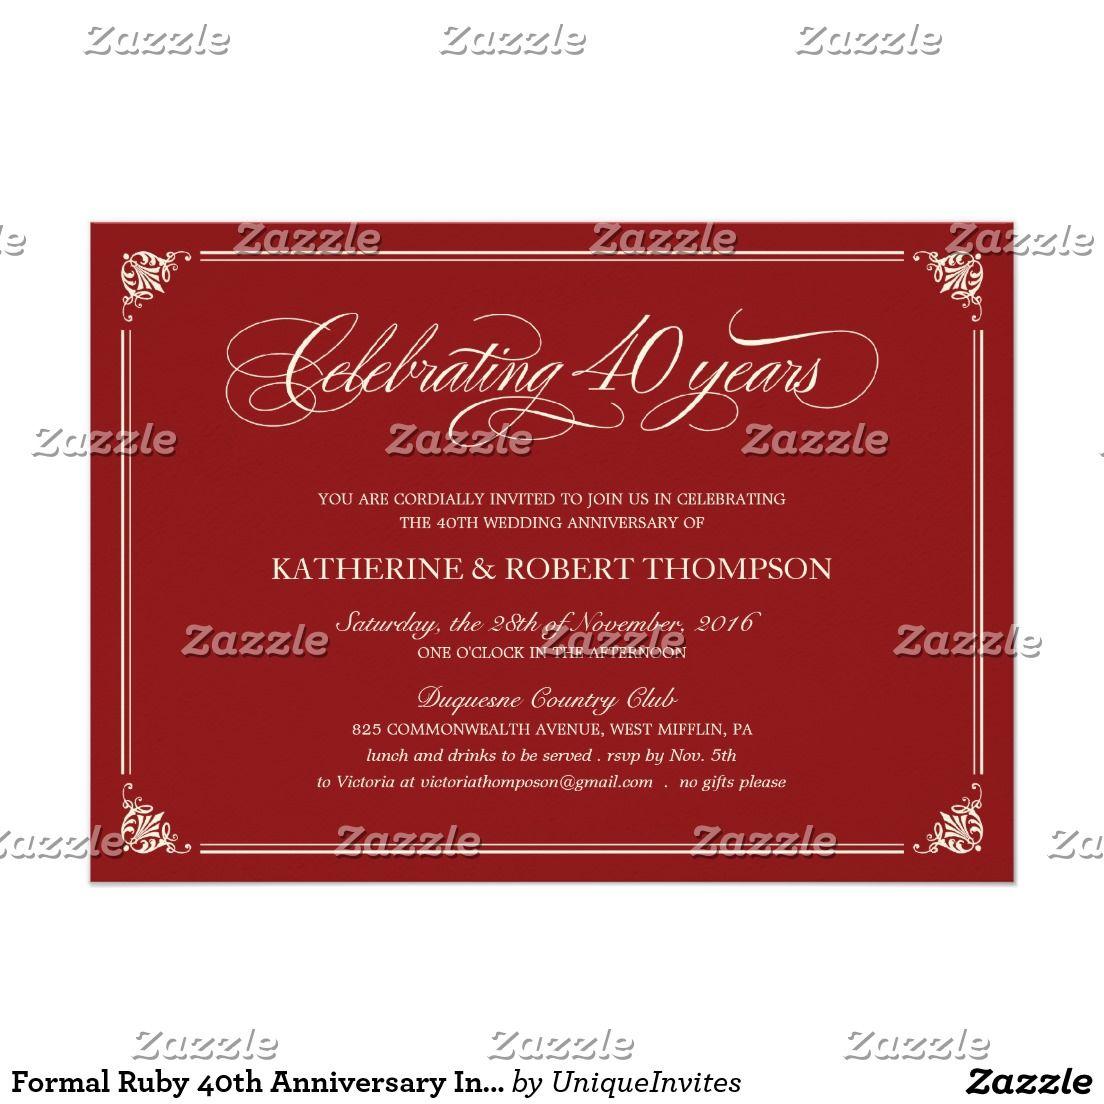 Formal Ruby 40th Anniversary Invitations | Pinterest | 40th ...